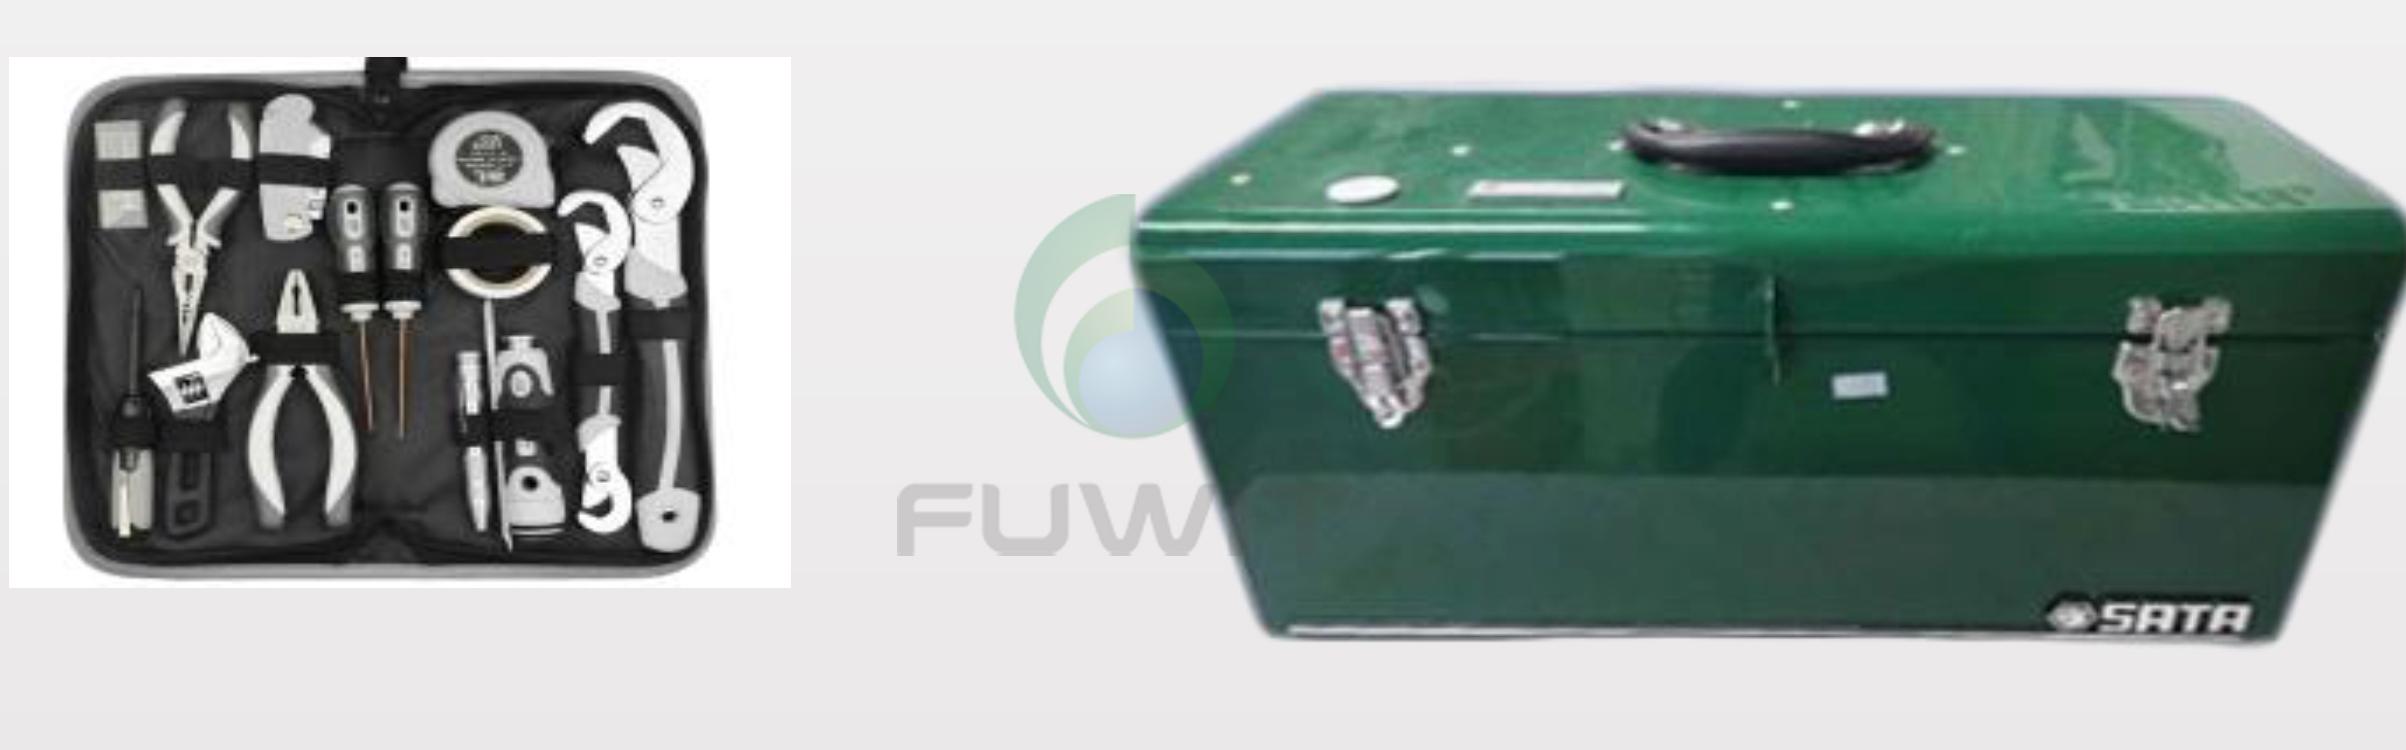 RFID智能工具箱,RFID工具管理,RFID